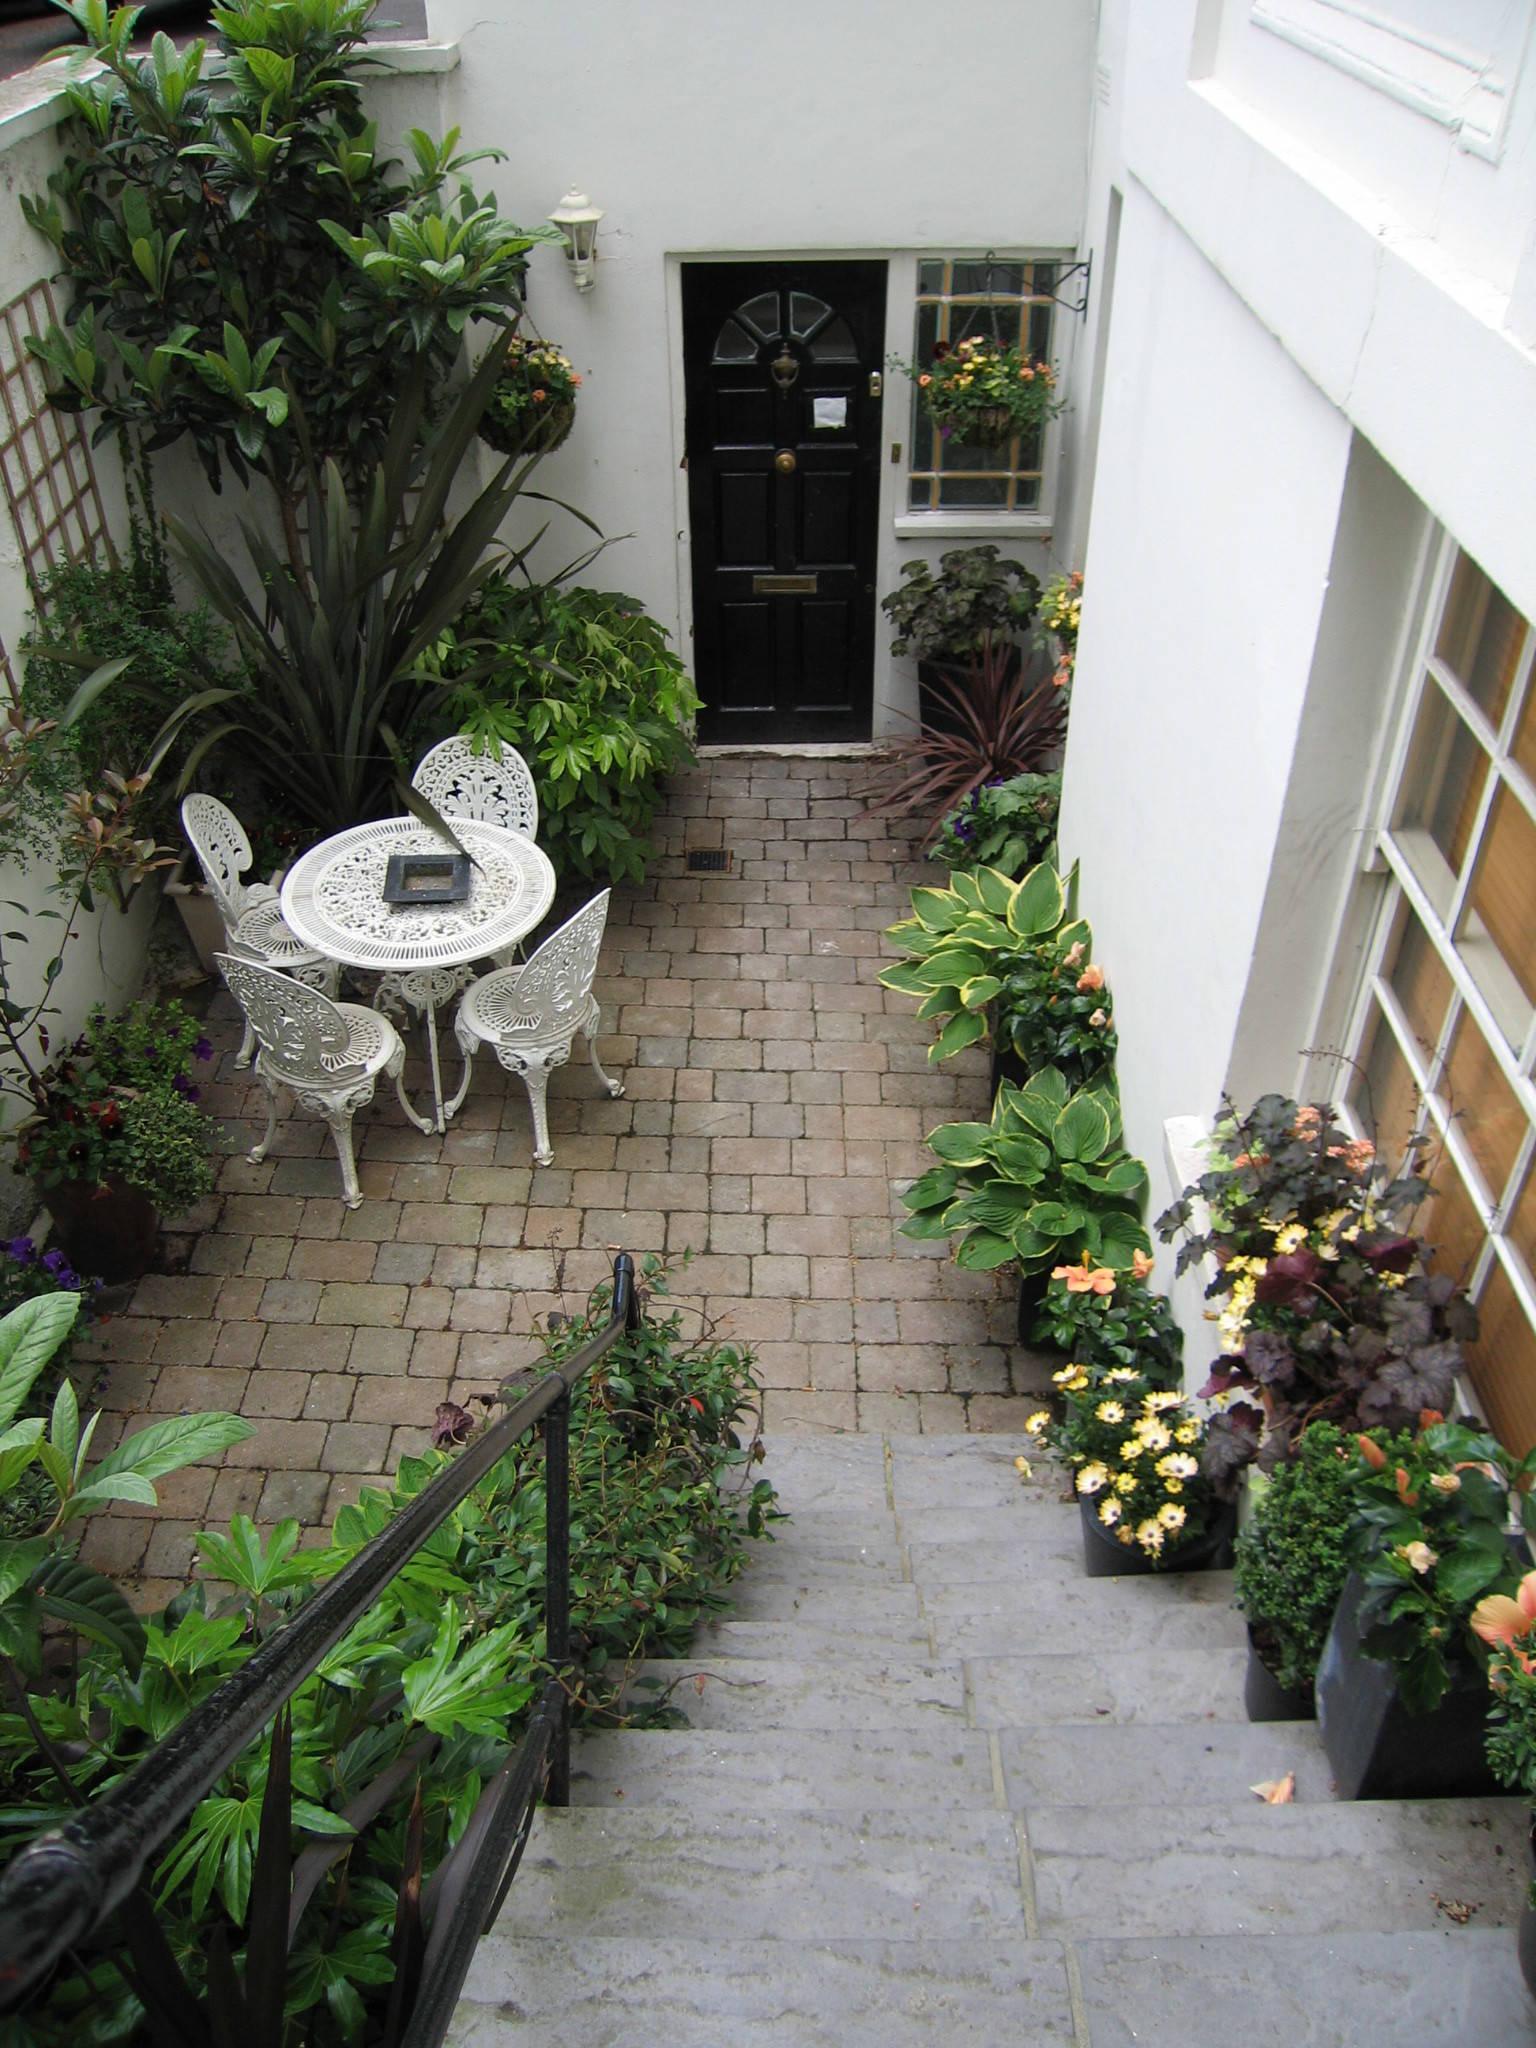 The Best Plants for a Small, Dark Courtyard Garden   Houzz UK